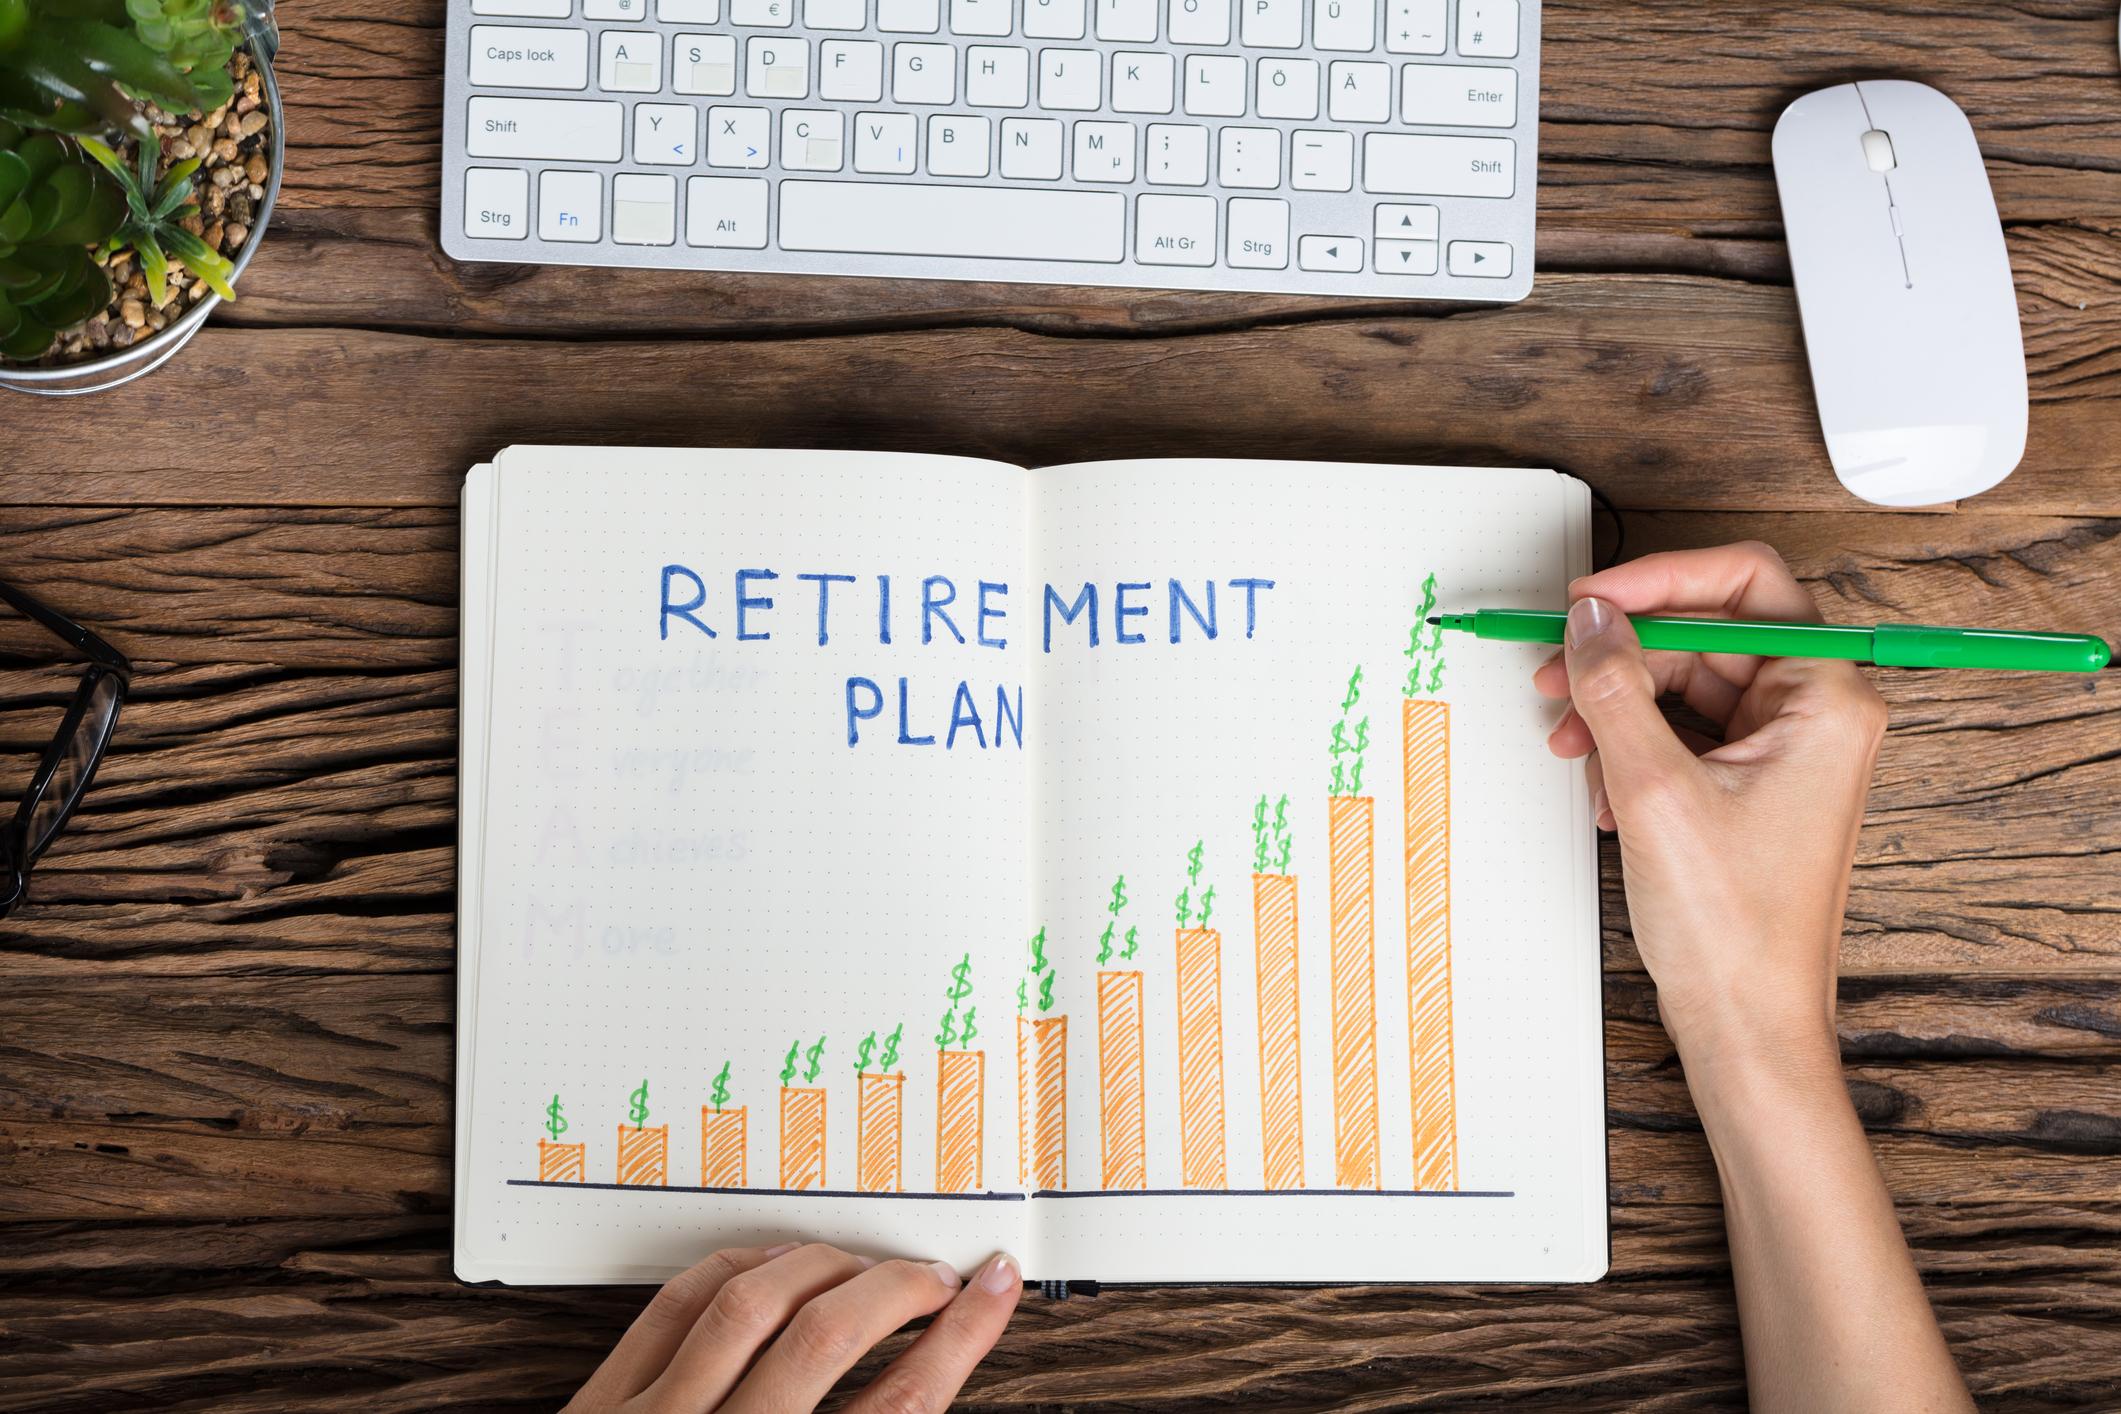 Retirement plan chart